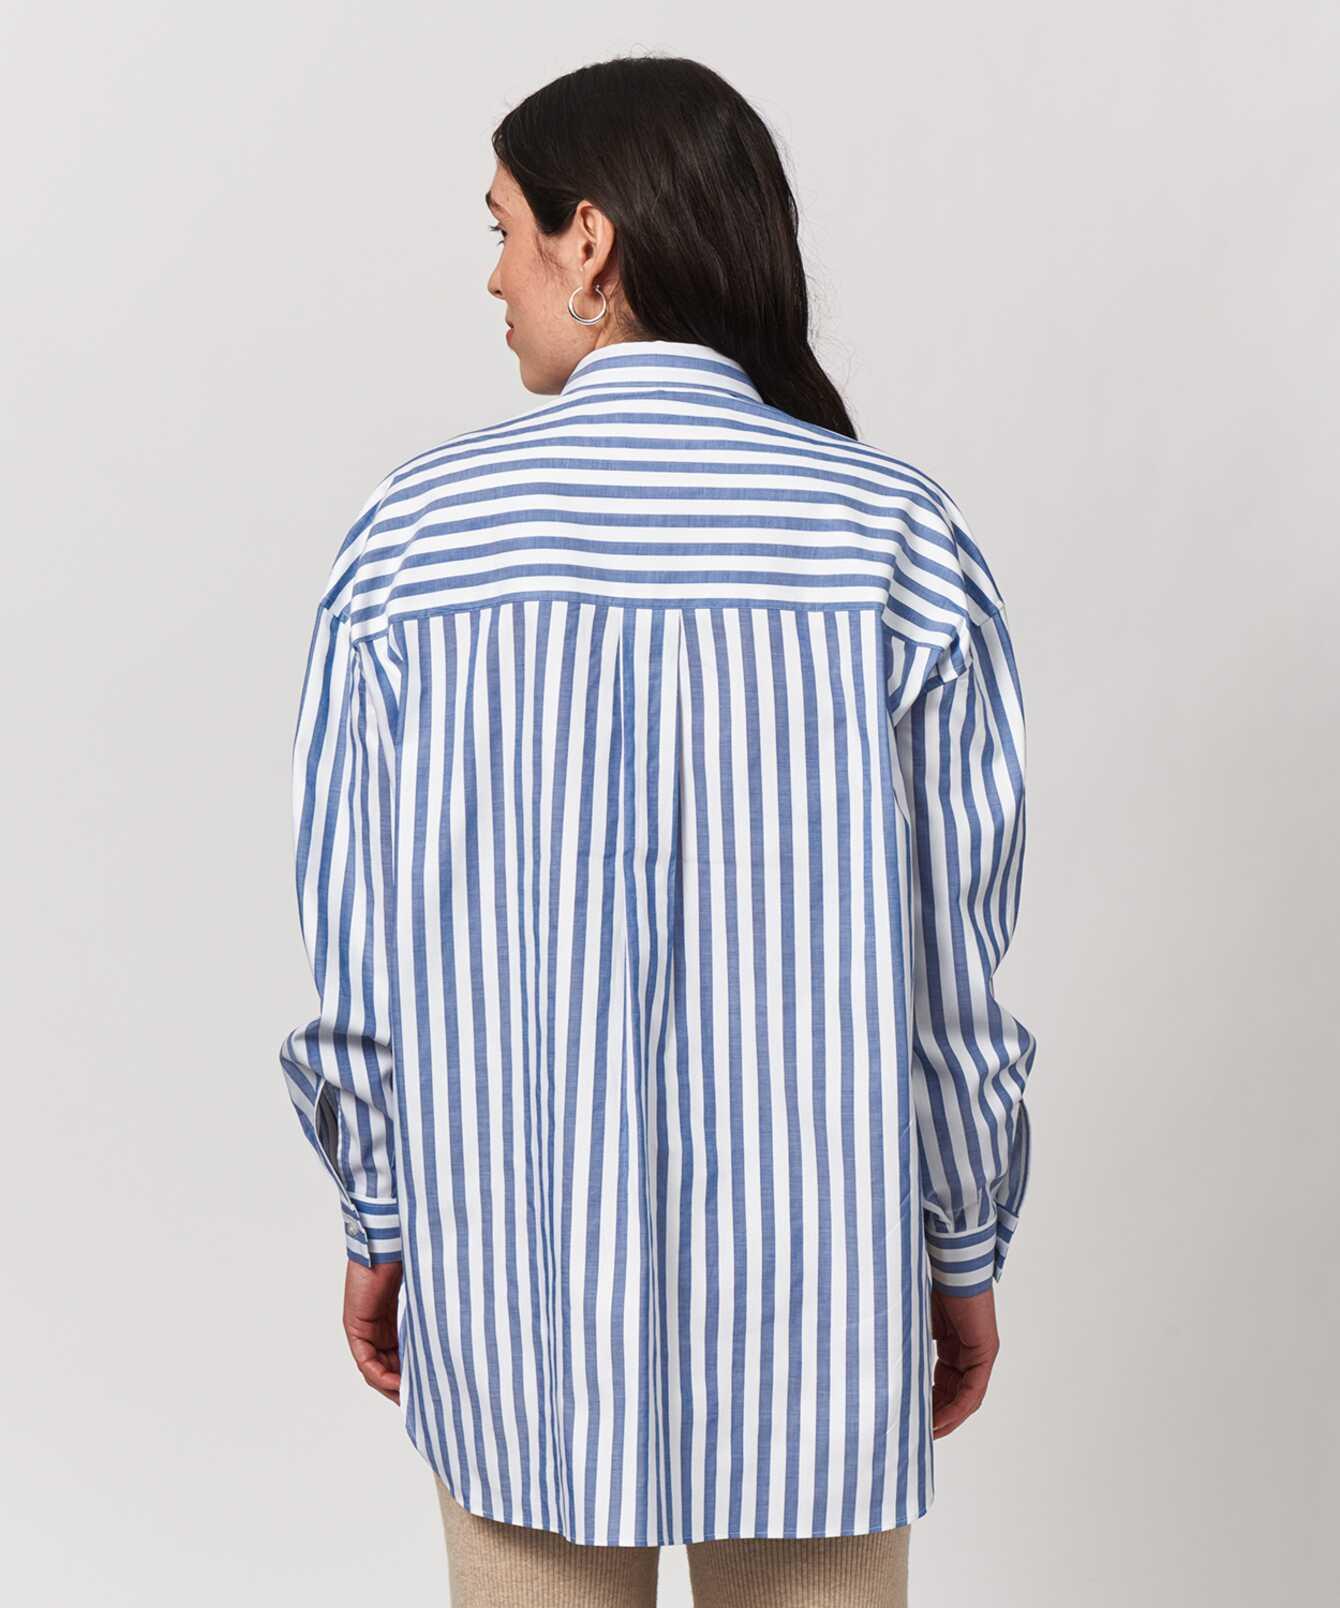 Skjorta Elsa Cotton Stripe The Shirt Factory